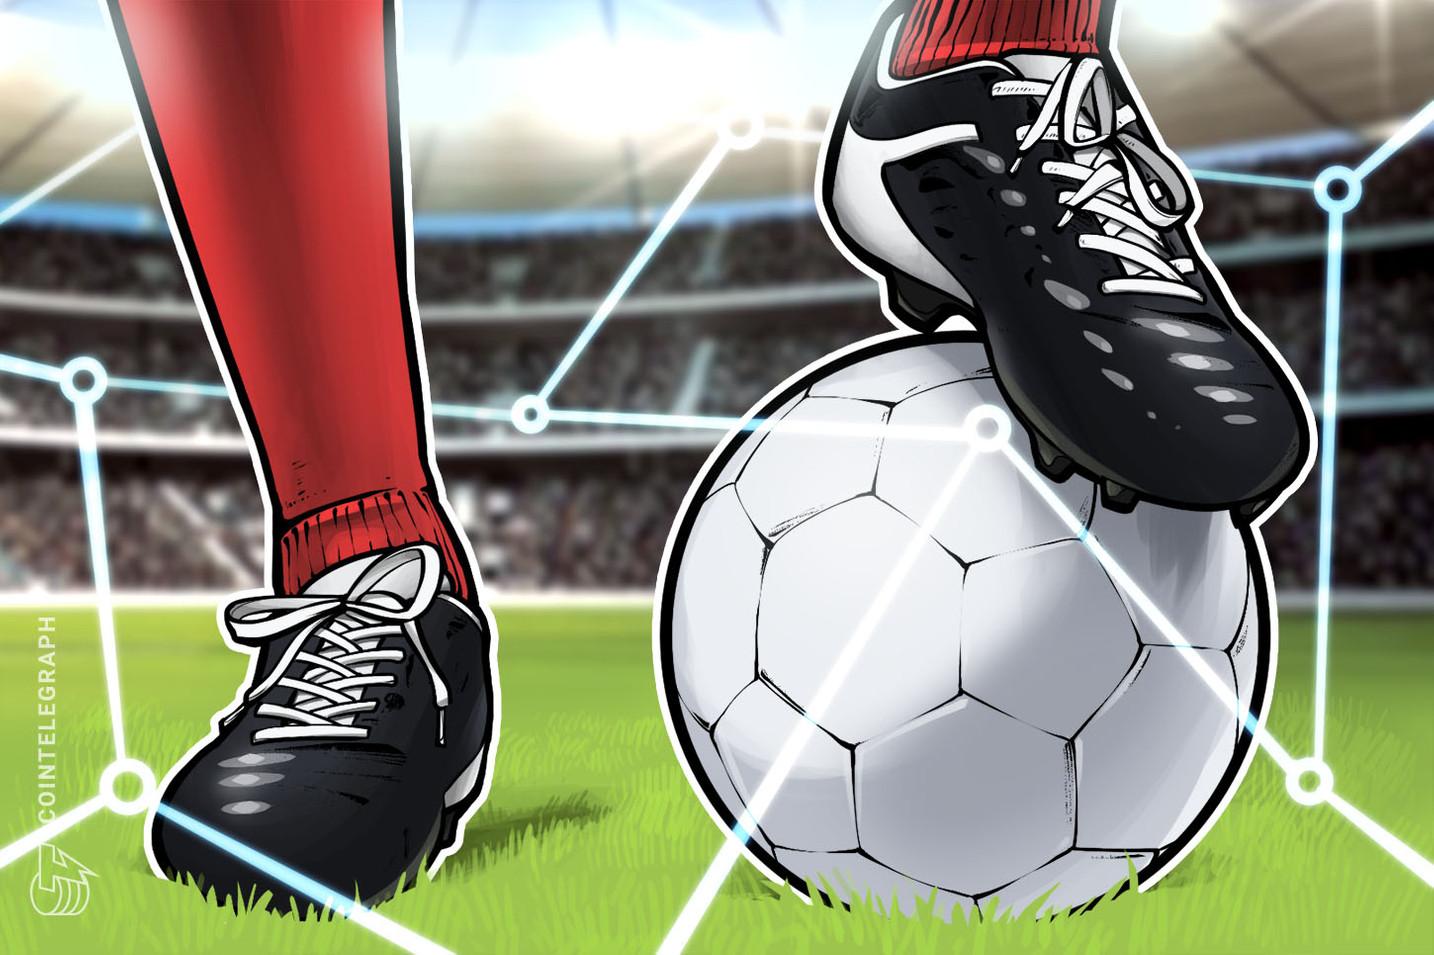 Krypto-Handelsplattform eToro wird neuer Sponsor des FC Everton